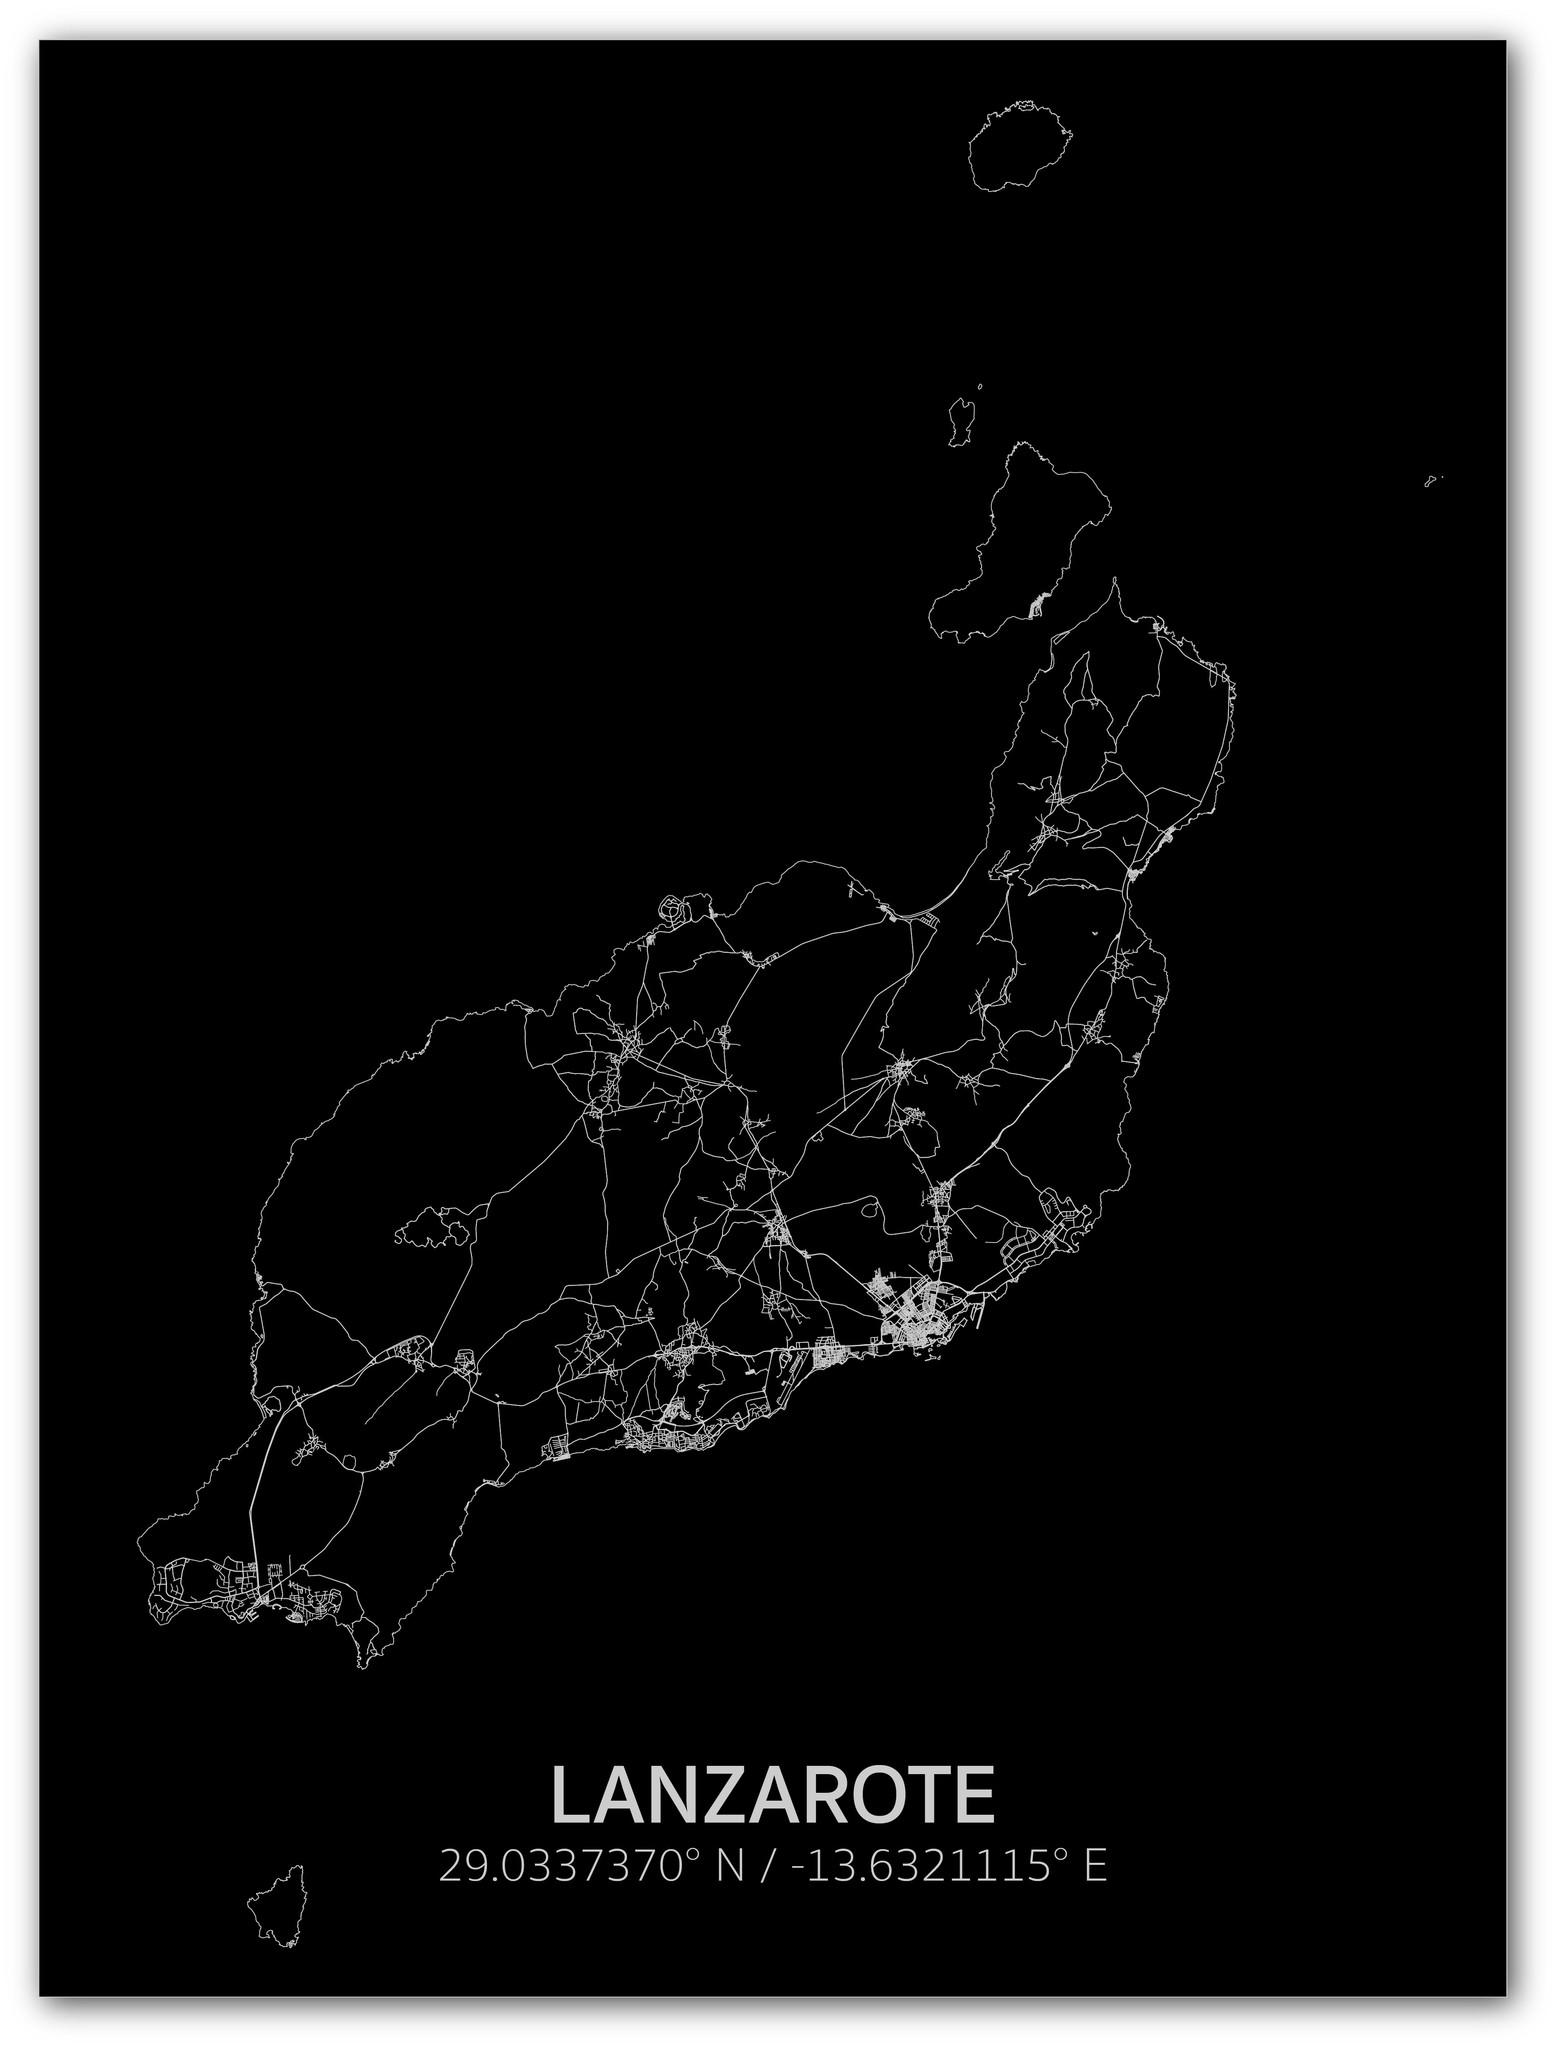 Stadtkarte Lanzarote | Aluminium Wanddekoration-1